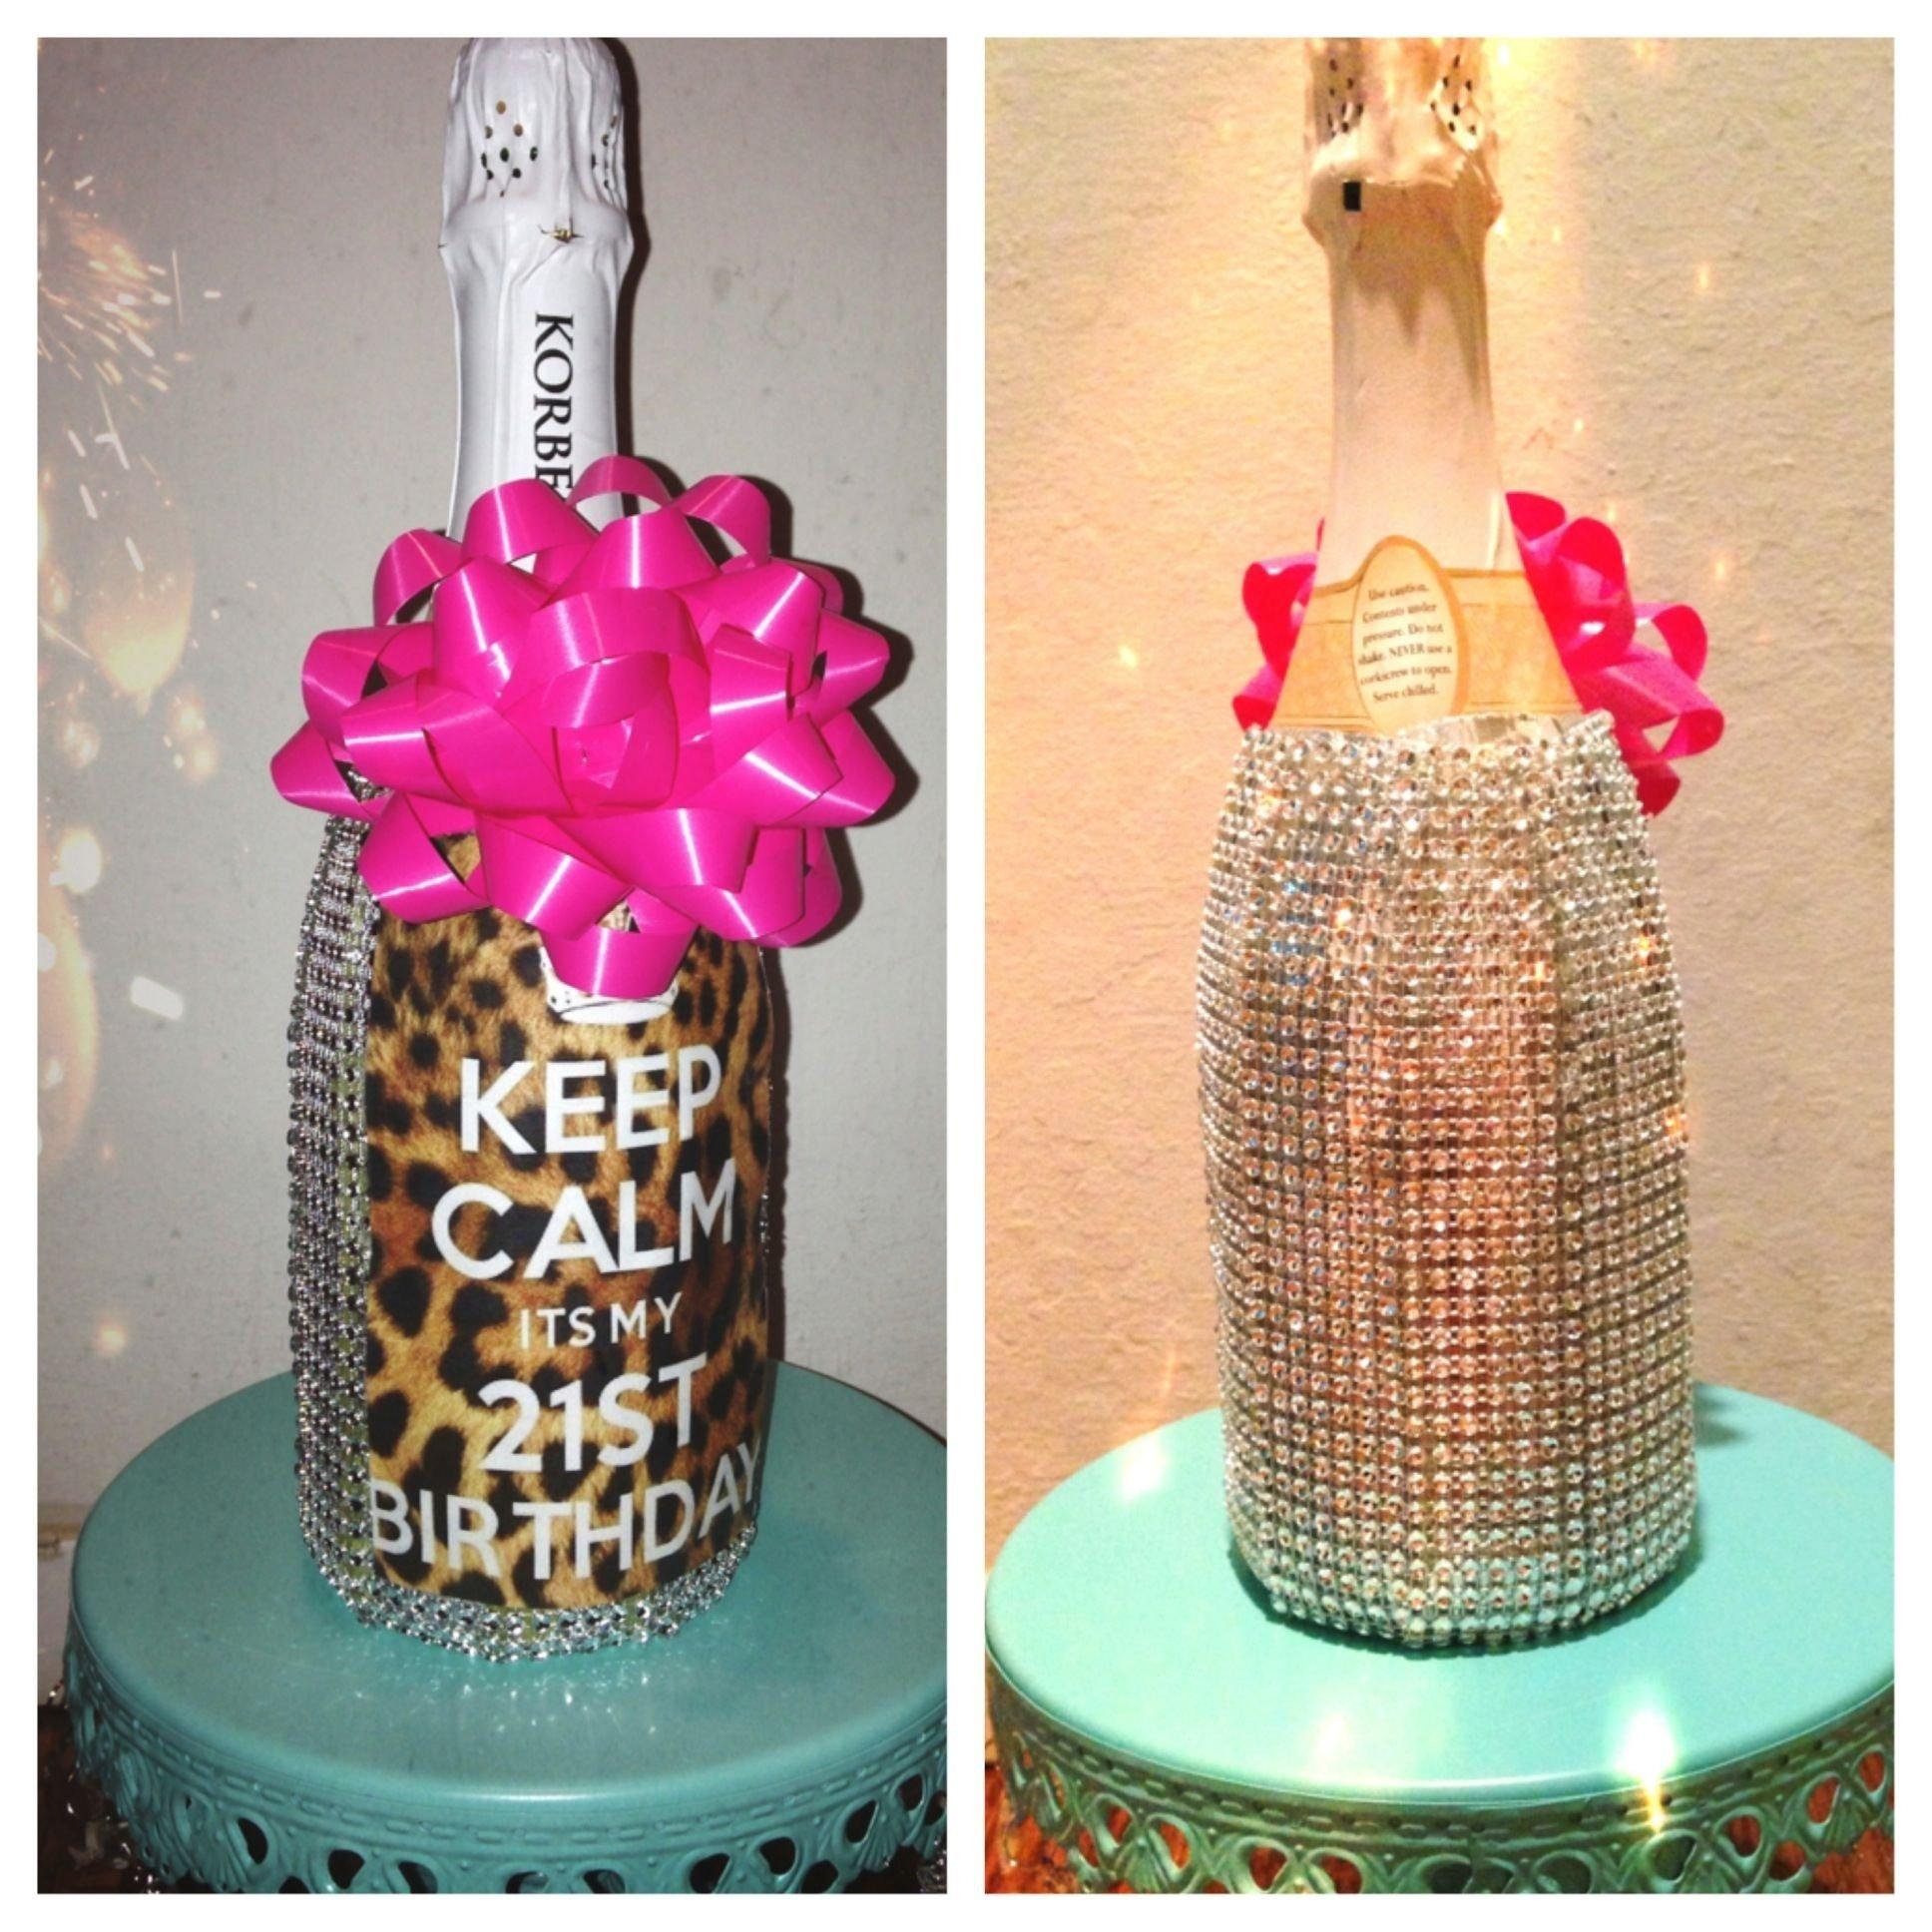 10 Unique 21 Year Old Birthday Ideas birthday gifts for 21 year old women 21 birthday gifts 21st 1 2020